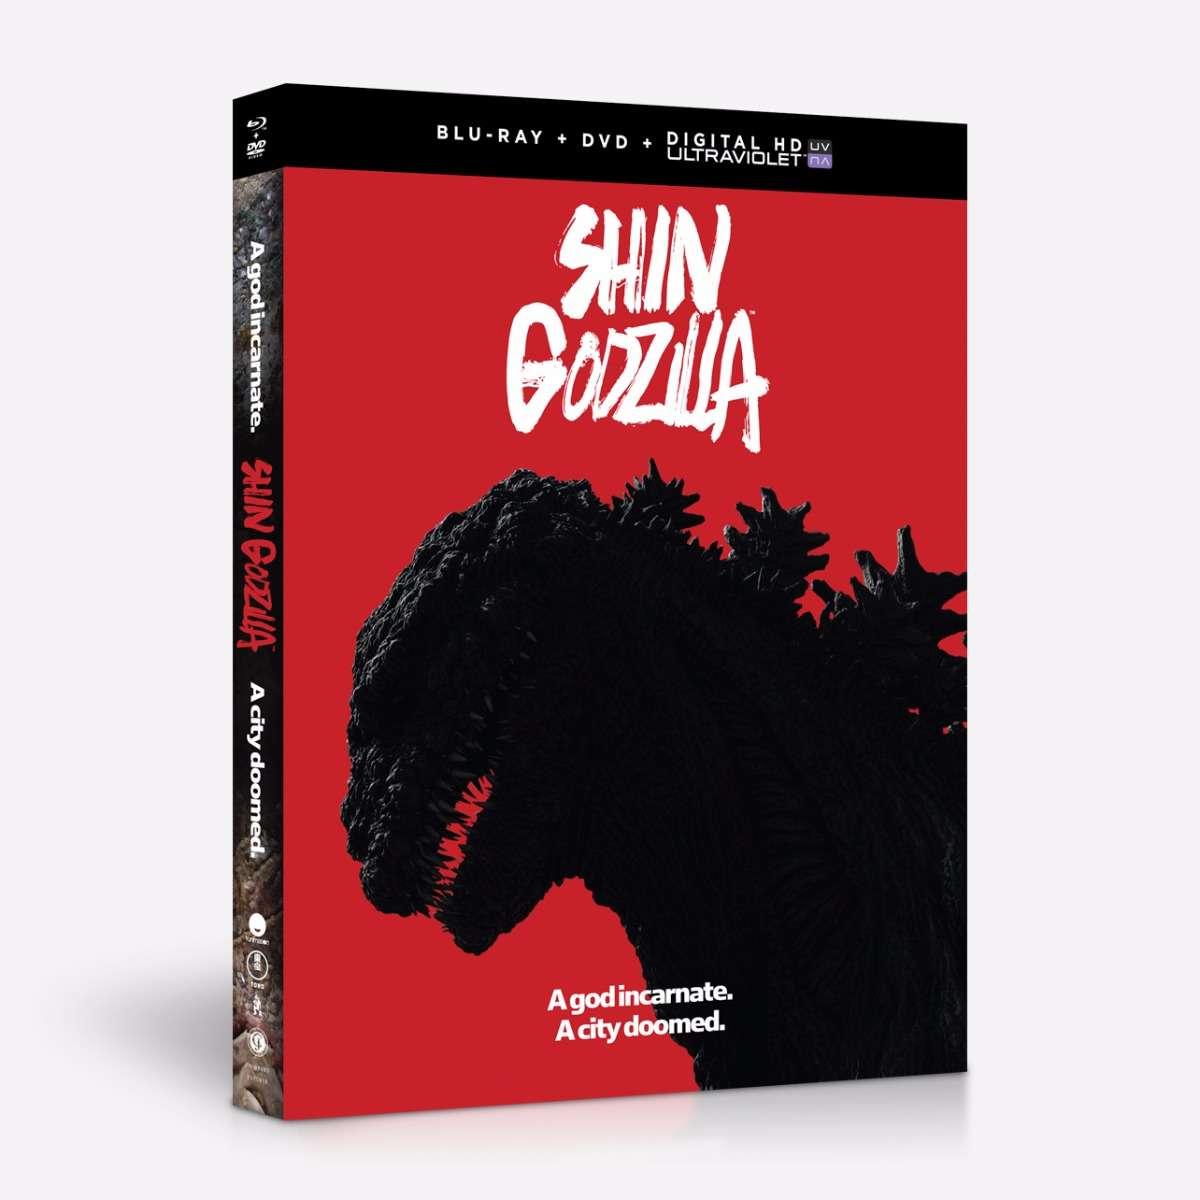 Movie - BD/DVD Combo + UV home-video